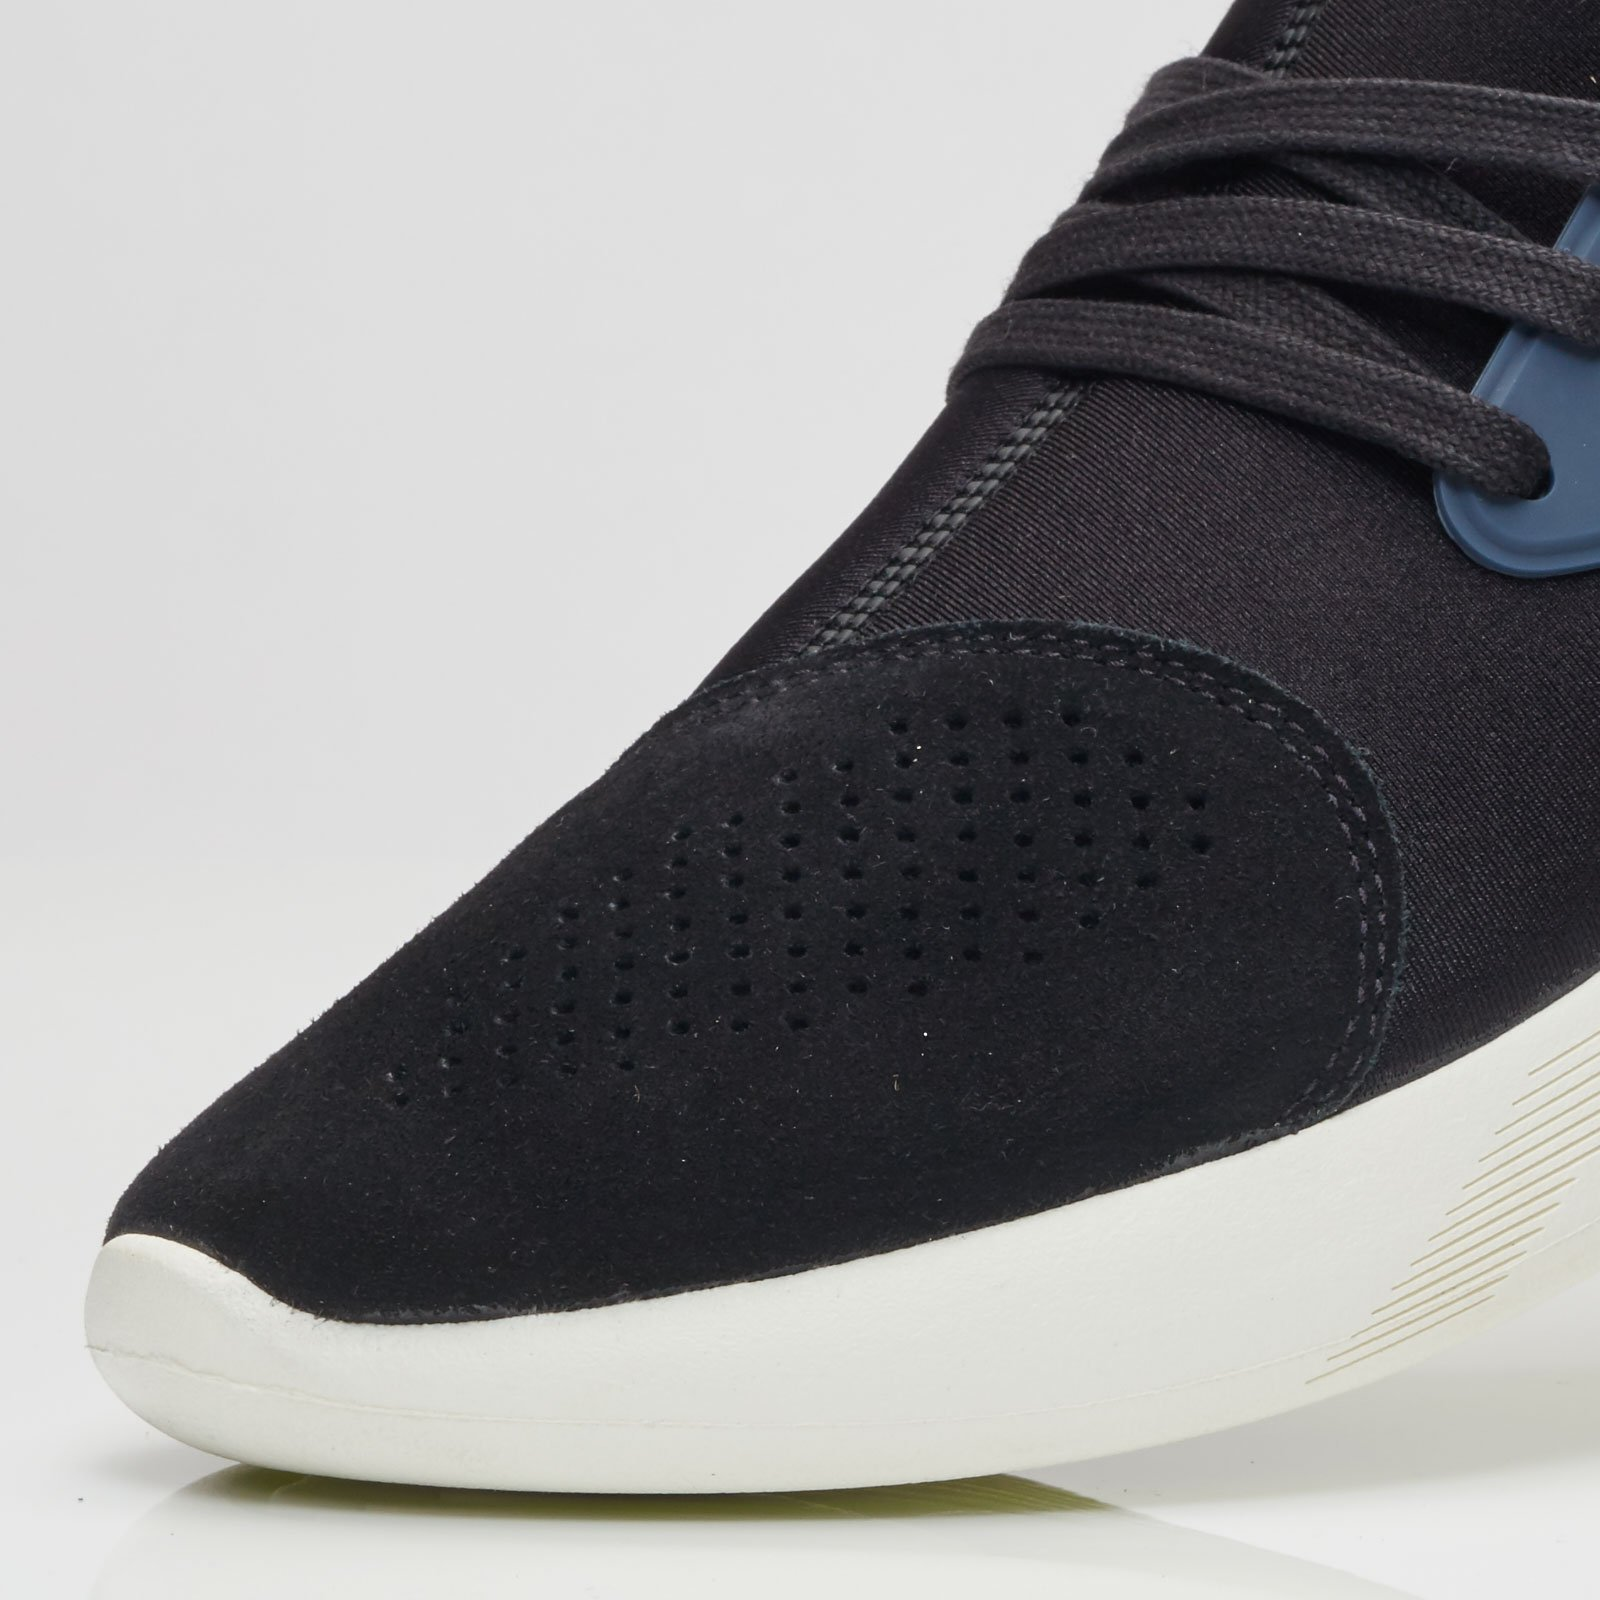 Nike Lunarcharge Premium - 923281-014 - Sneakersnstuff  f8d1c4511